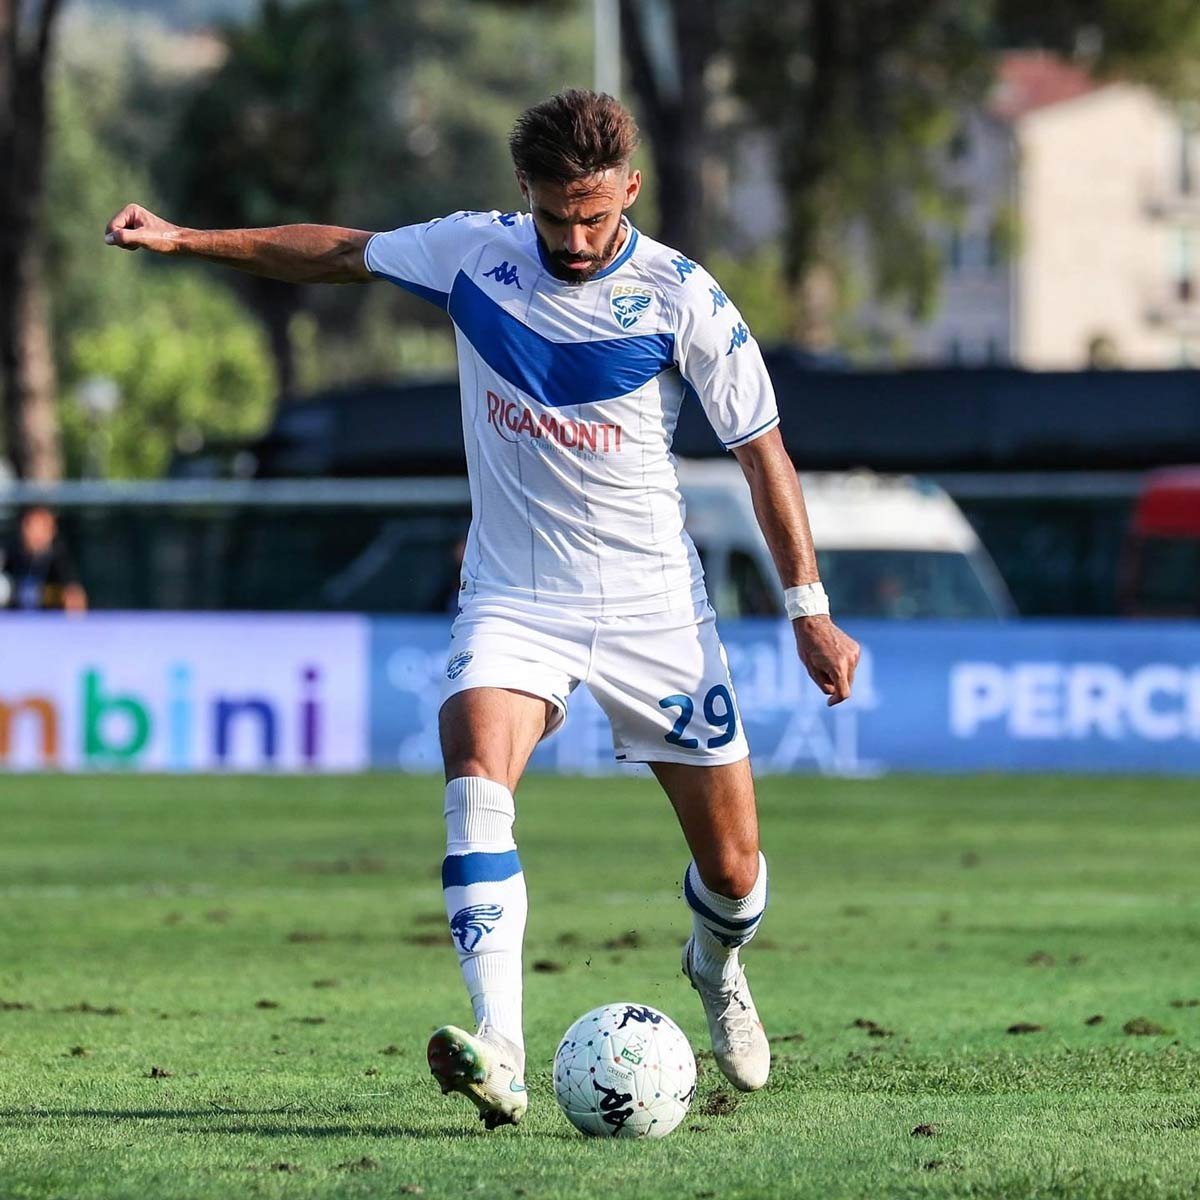 Divisa Brescia away bianca